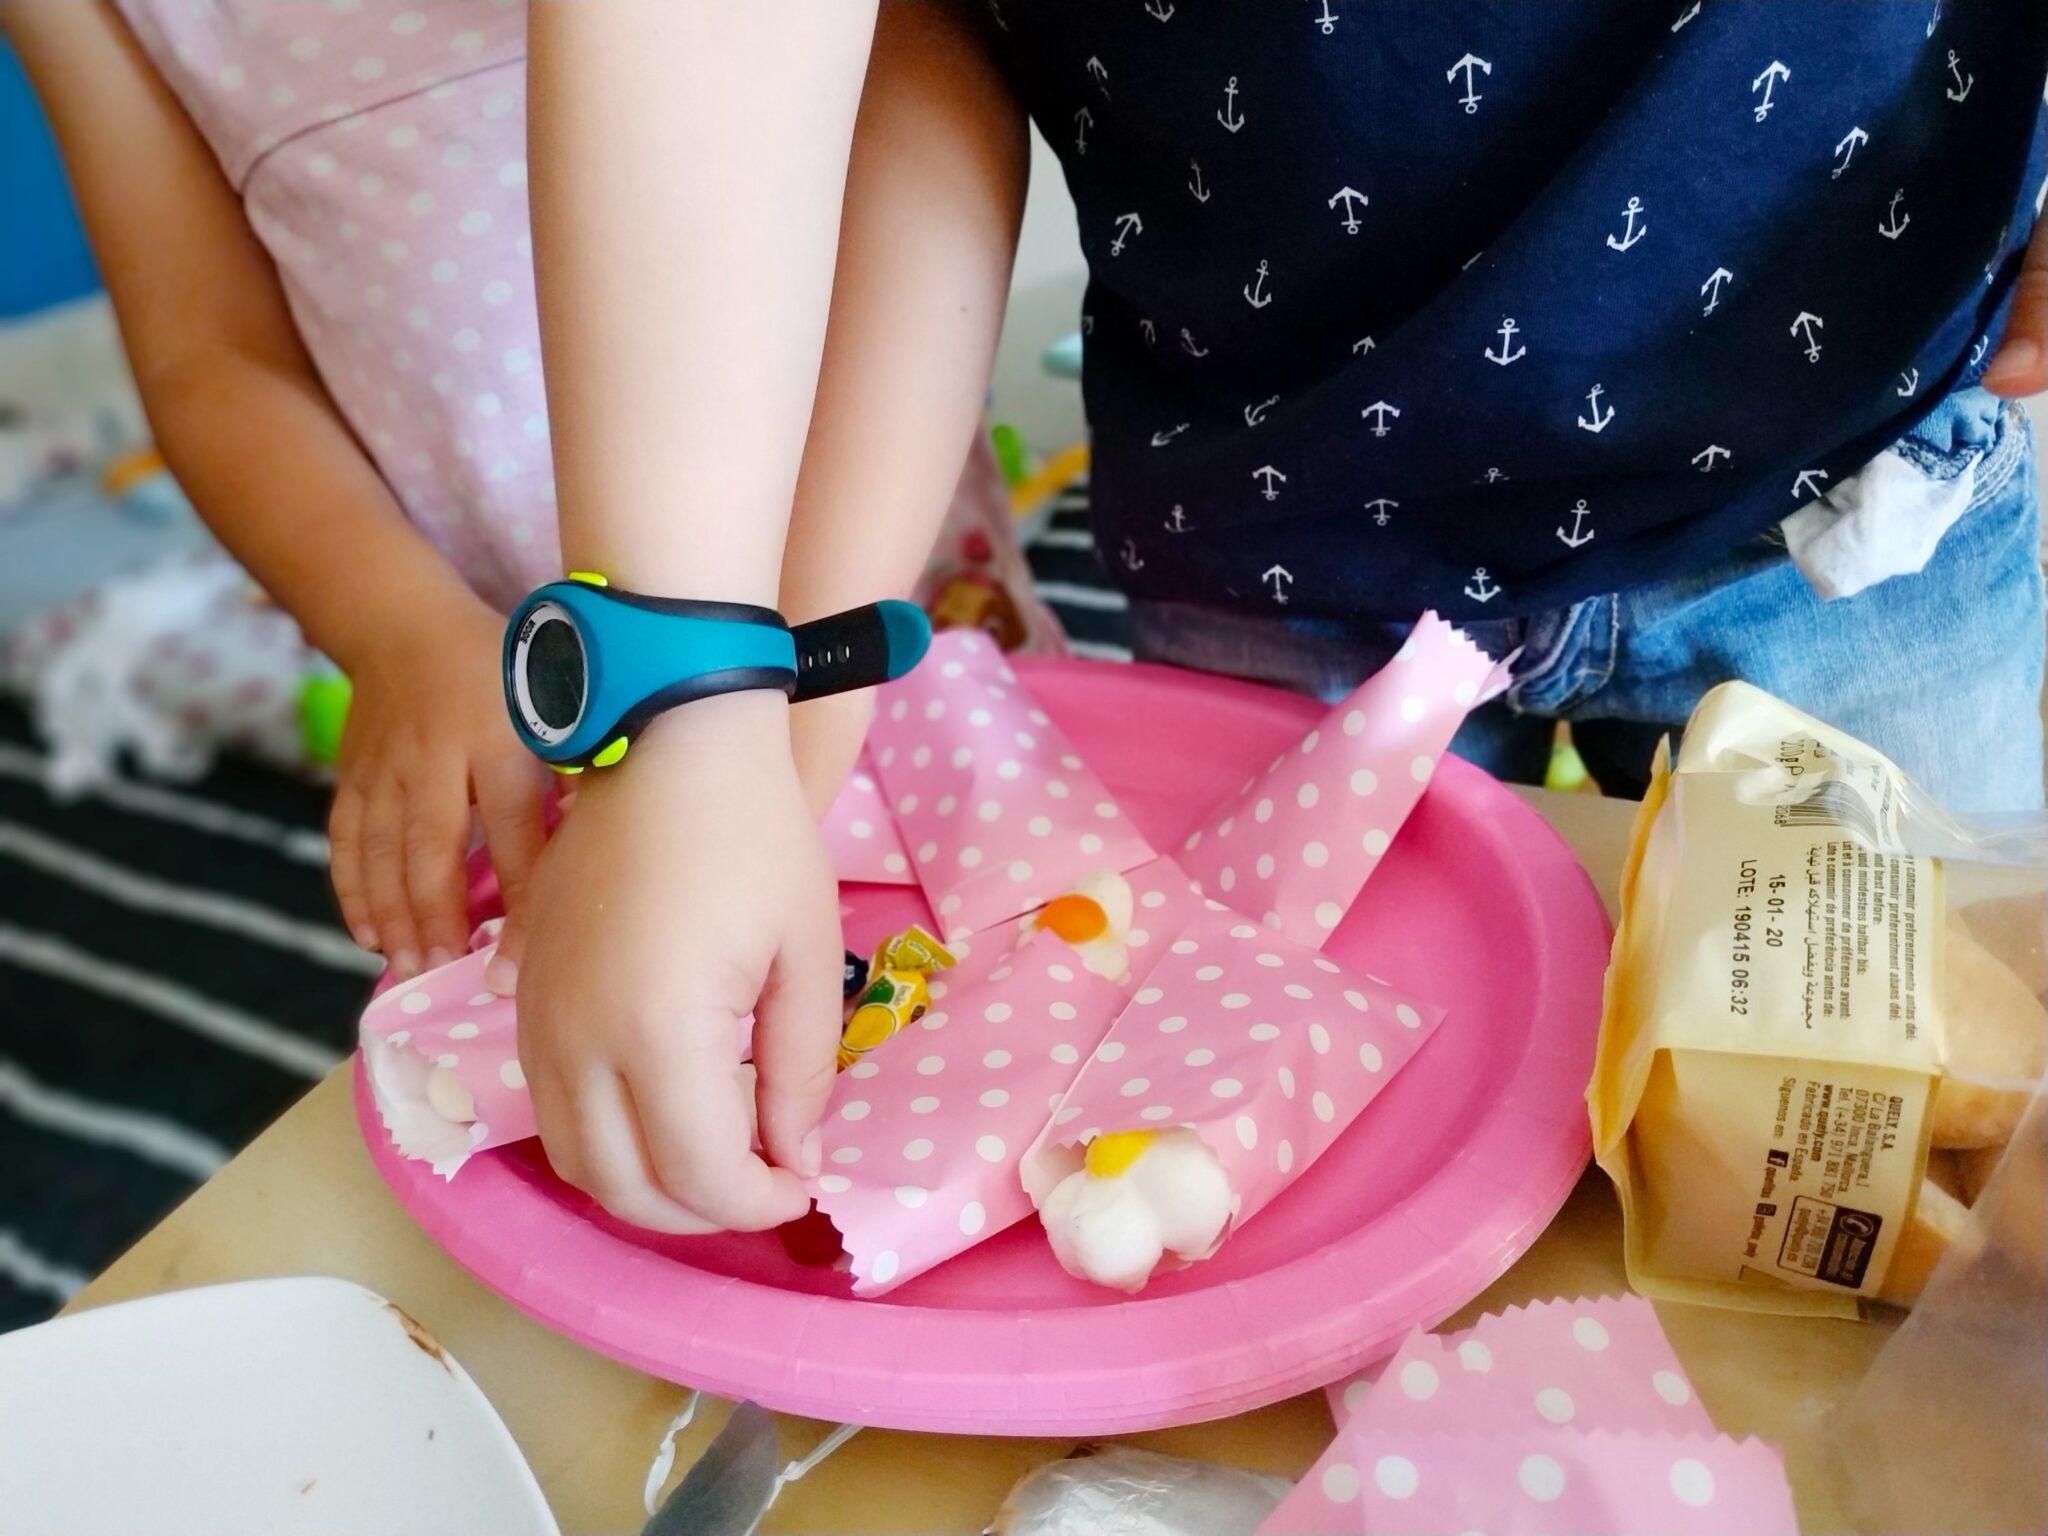 img 20190615 015303256064368957792555 - Organizar un cumpleaños infantil